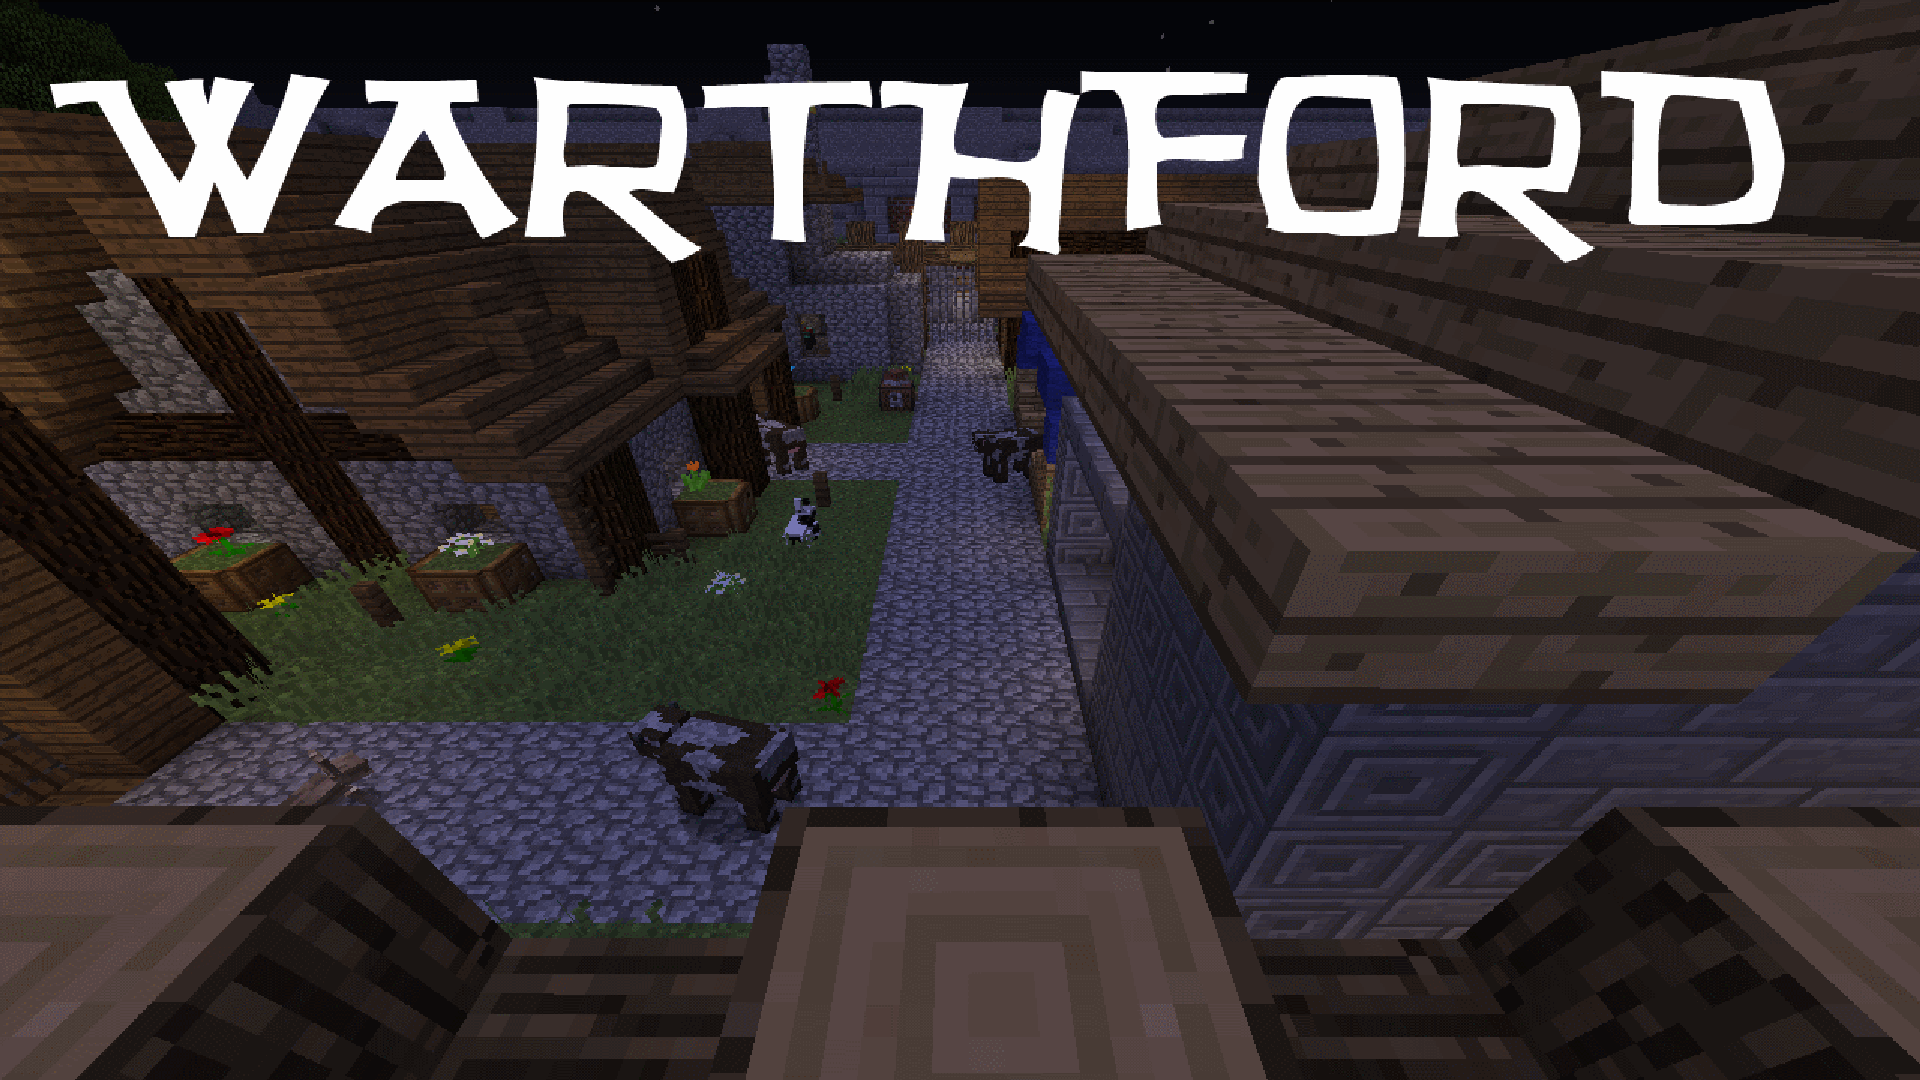 Warthford